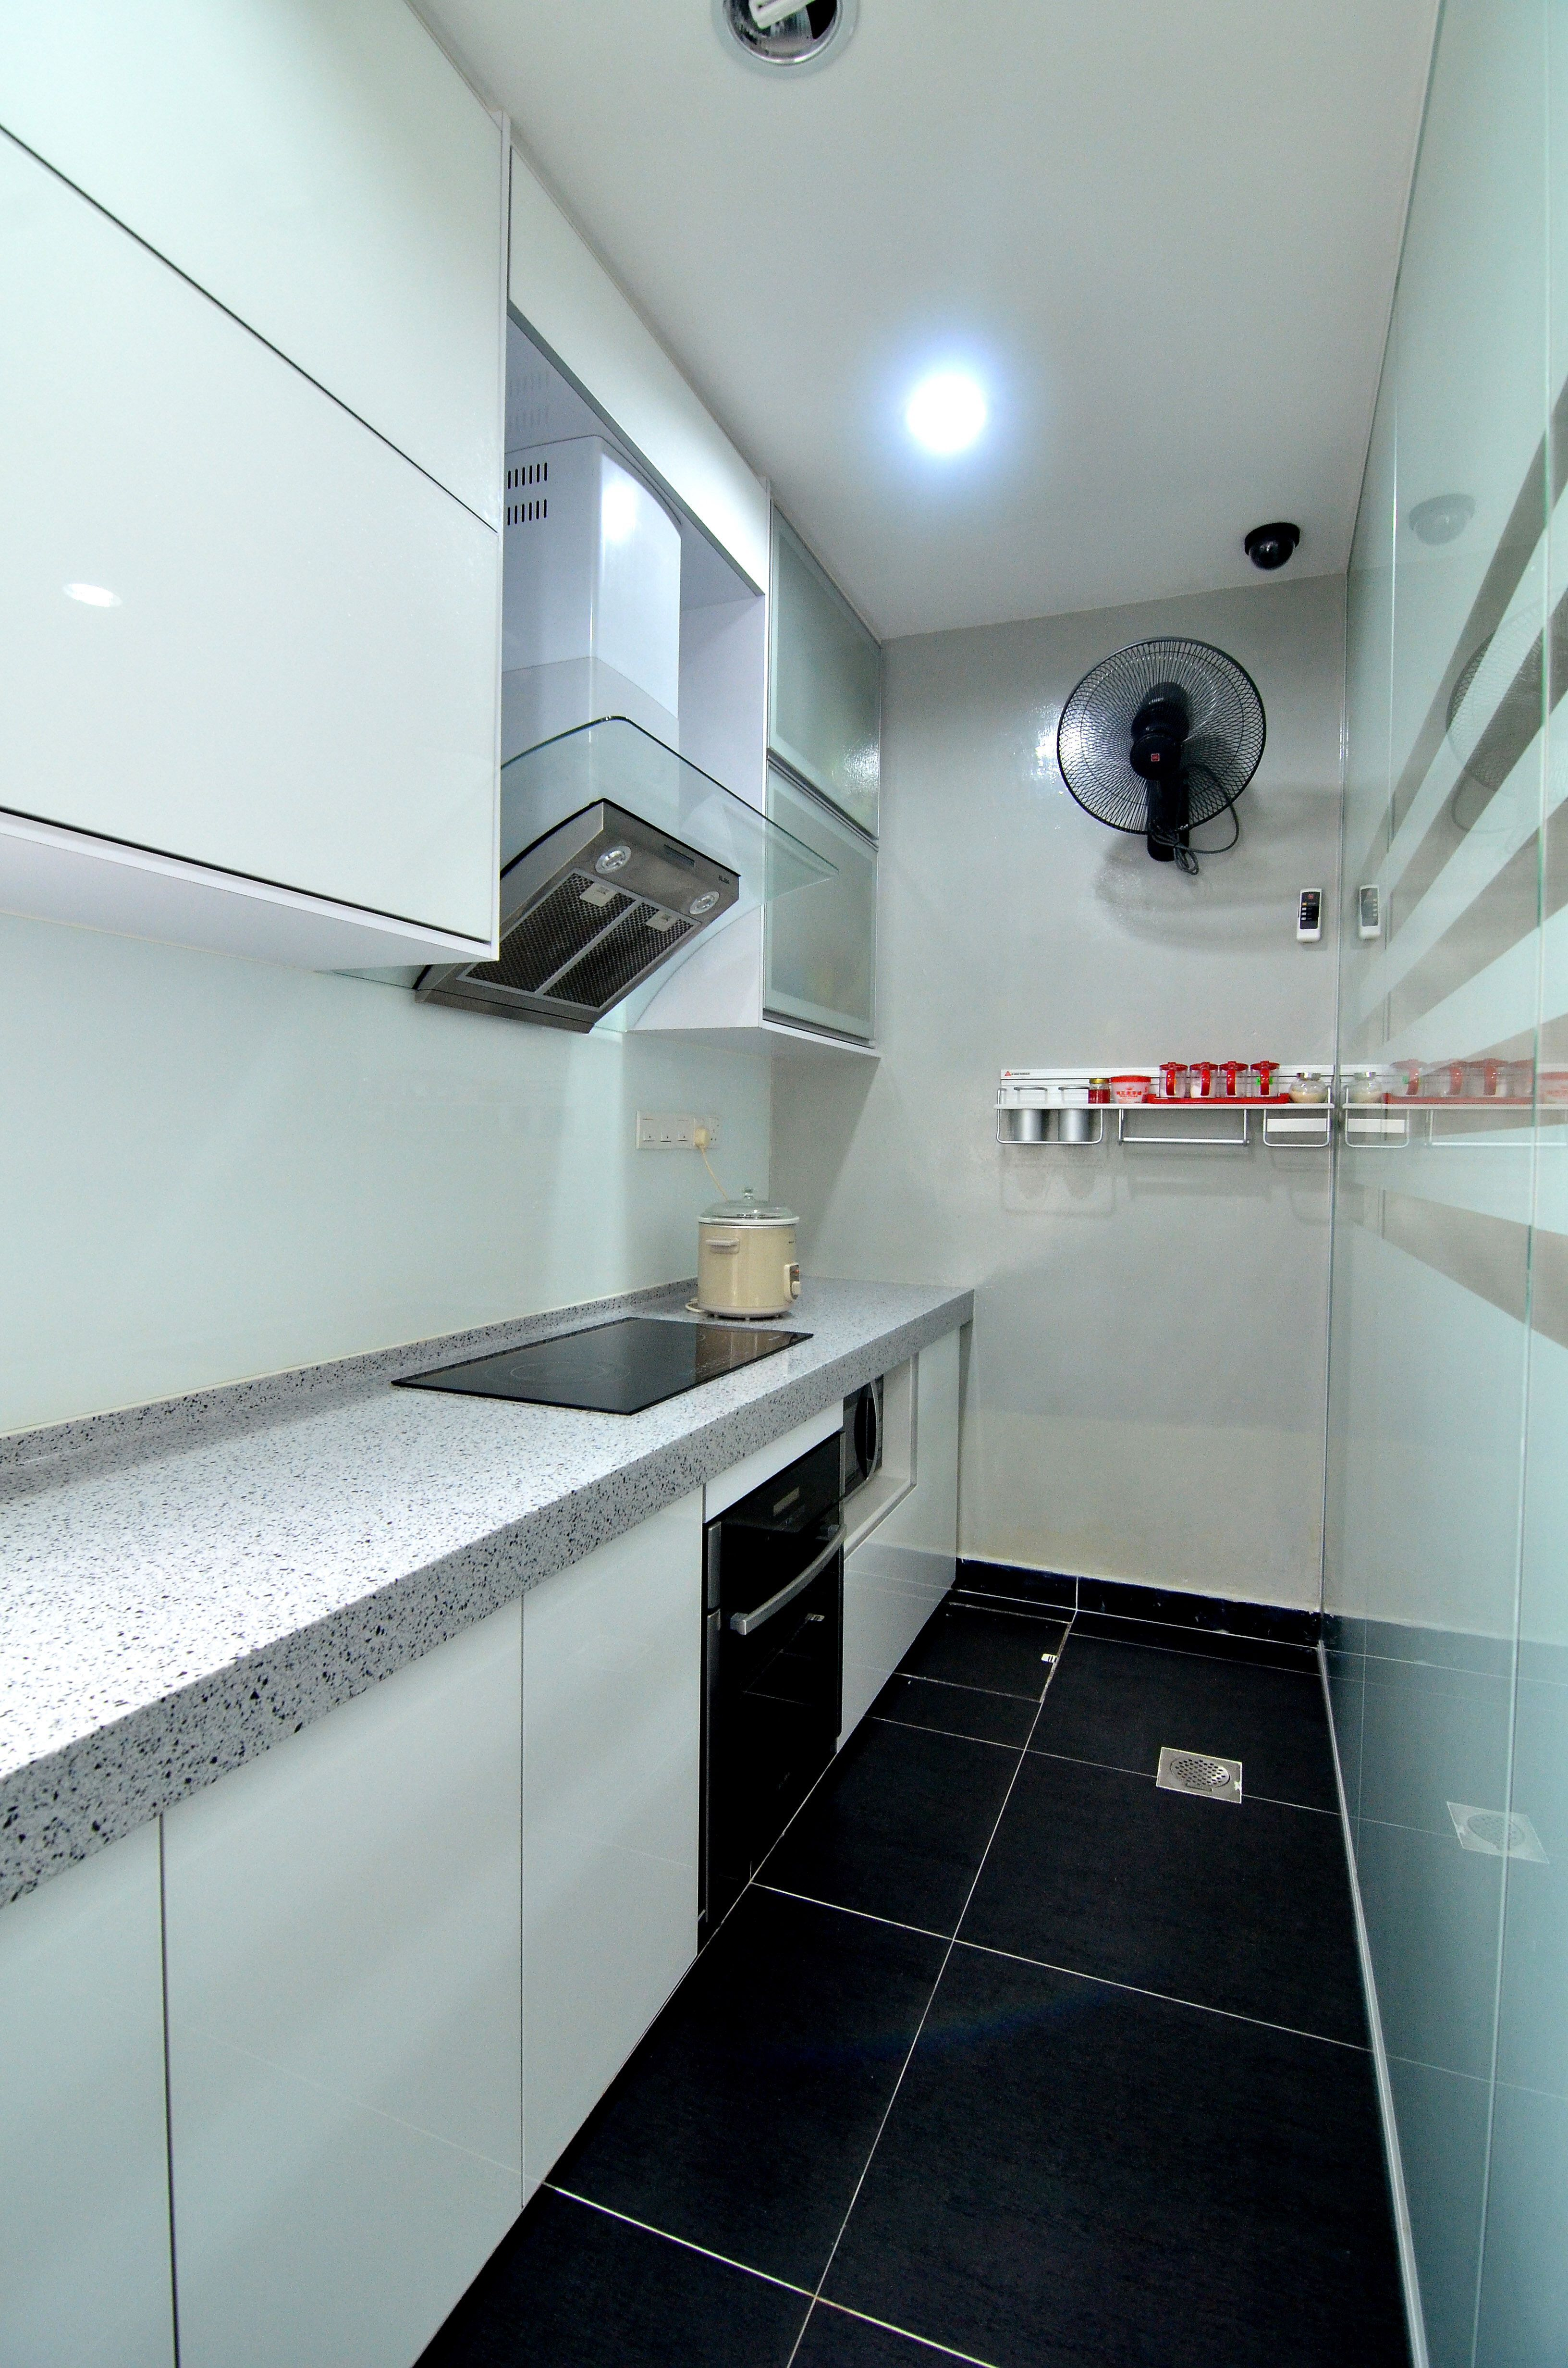 Small Wet Kitchen Design Kitchen Kitchen KitchenDesign ...